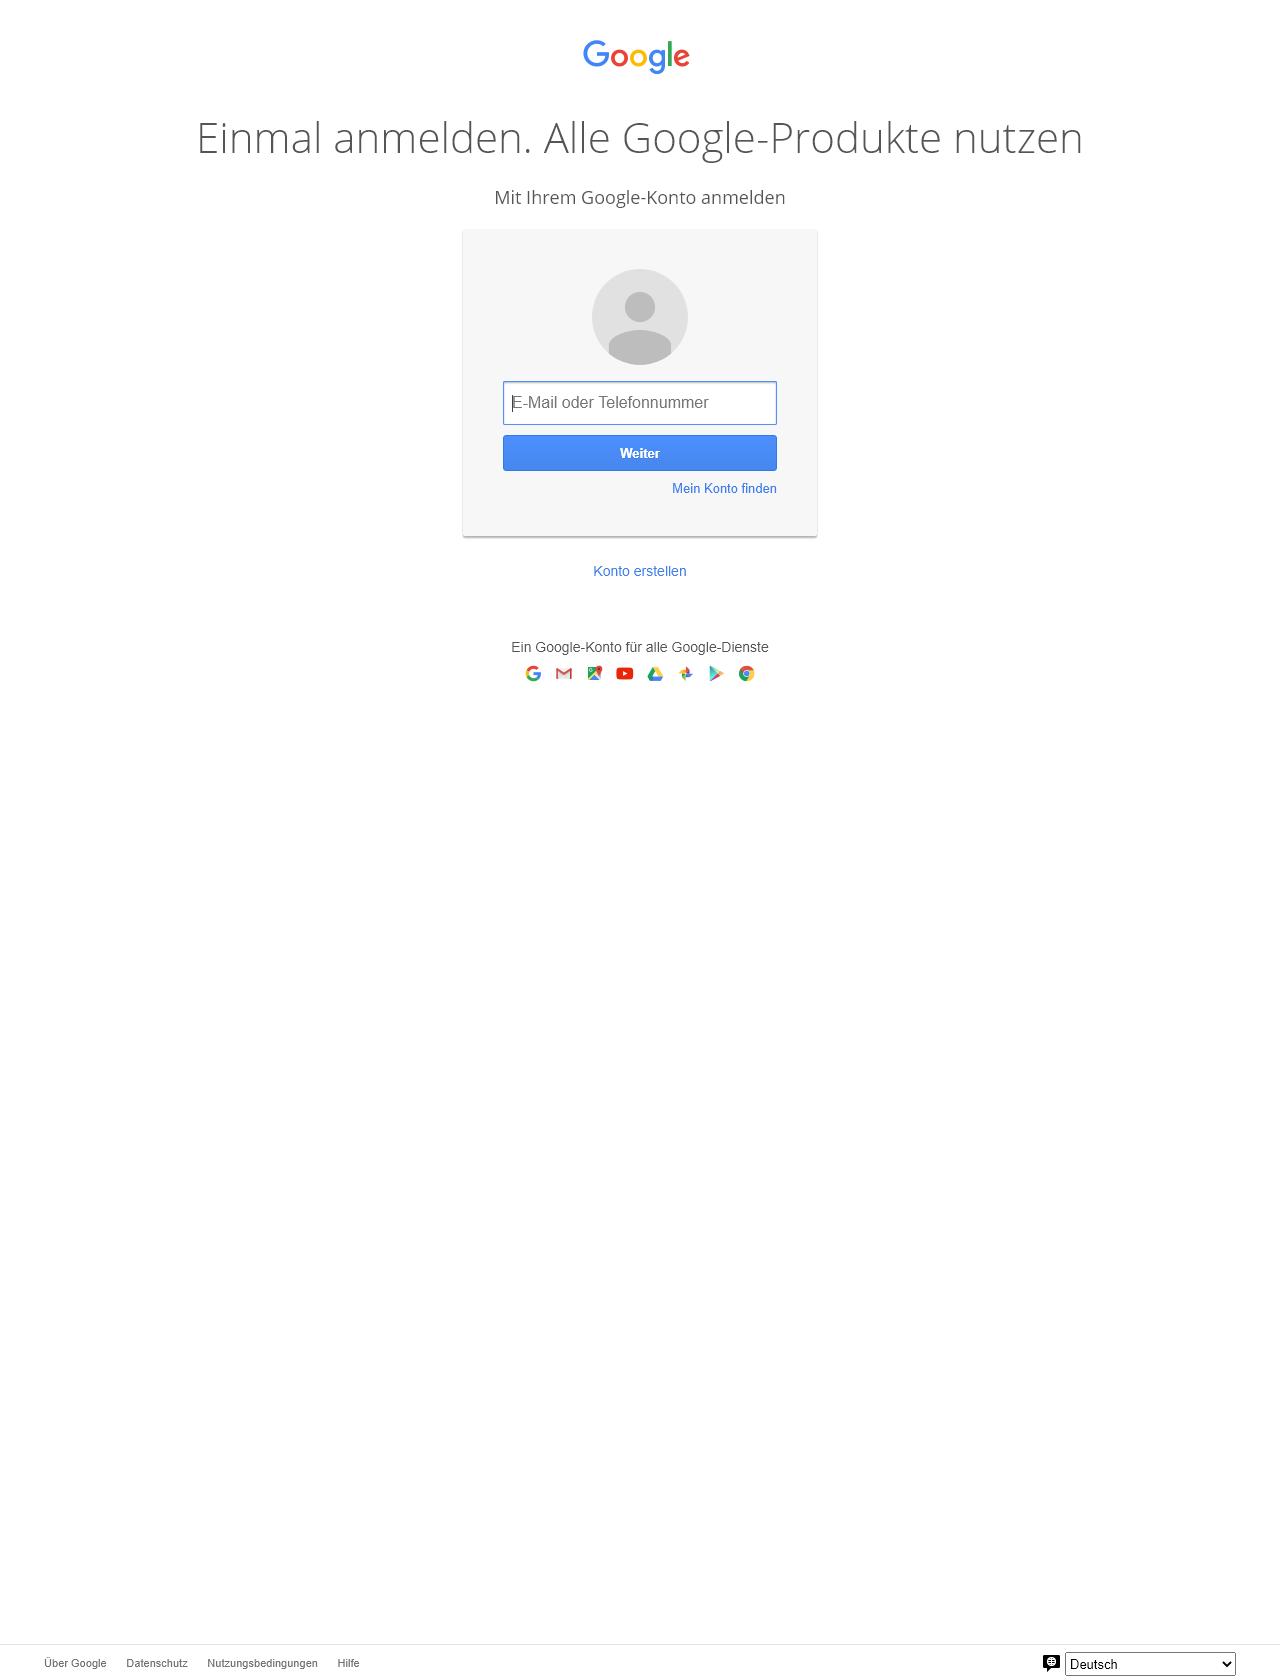 Screenshot Desktop - https://accounts.google.com/ServiceLogin?continue=https%3A%2F%2Faccounts.google.com%2Fsignin%2Foauth%2Flegacy%2Fconsent%3Fauthuser%3Dunknown%26part%3DAJi8hAOe-LZEejLOBQnKJ_aUPAjCWrUYmwYVmhPFadqLHb7O3iZd0sd1iSSL6KVNzAvsEIPmOKY-5O9NermXeCOAzkVDygpsA1D4tSfVCuUccdUp6DoVb8rnD92EwI_7_j2dehhIp_aa2KBzUJEiGeokBLRvZc5jjbK4ejVHtdmarKEcIFsk8mMiGZ0V6u_qNYLdTQTDGyCoS_2bAFGF0evkgr7XV98A1CzEtHdwFyrvIdIEAx8nUyr2BQo-QKCqKa11V8048twrPoT4MzCBiNa8VfPsOkBDsmiSBwFcs-5M4Q_2lCOT1eA7ZL_t1W9WpF5-LBOKYR7ZNonV9AwODV_TecifjDQWatvo3UvOSi7RkuJdKkT6evaqip6GY5NPeme52KRKXHwVkx2BdQBKqZu8EO9zN5Tp5xiP05SHwDGdzOGMZXpgQiRzR_o62-Pzchtn27Zjjog0%26as%3DS-2012392868%253A1596344593413866%23&sacu=1&oauth=1&rip=1